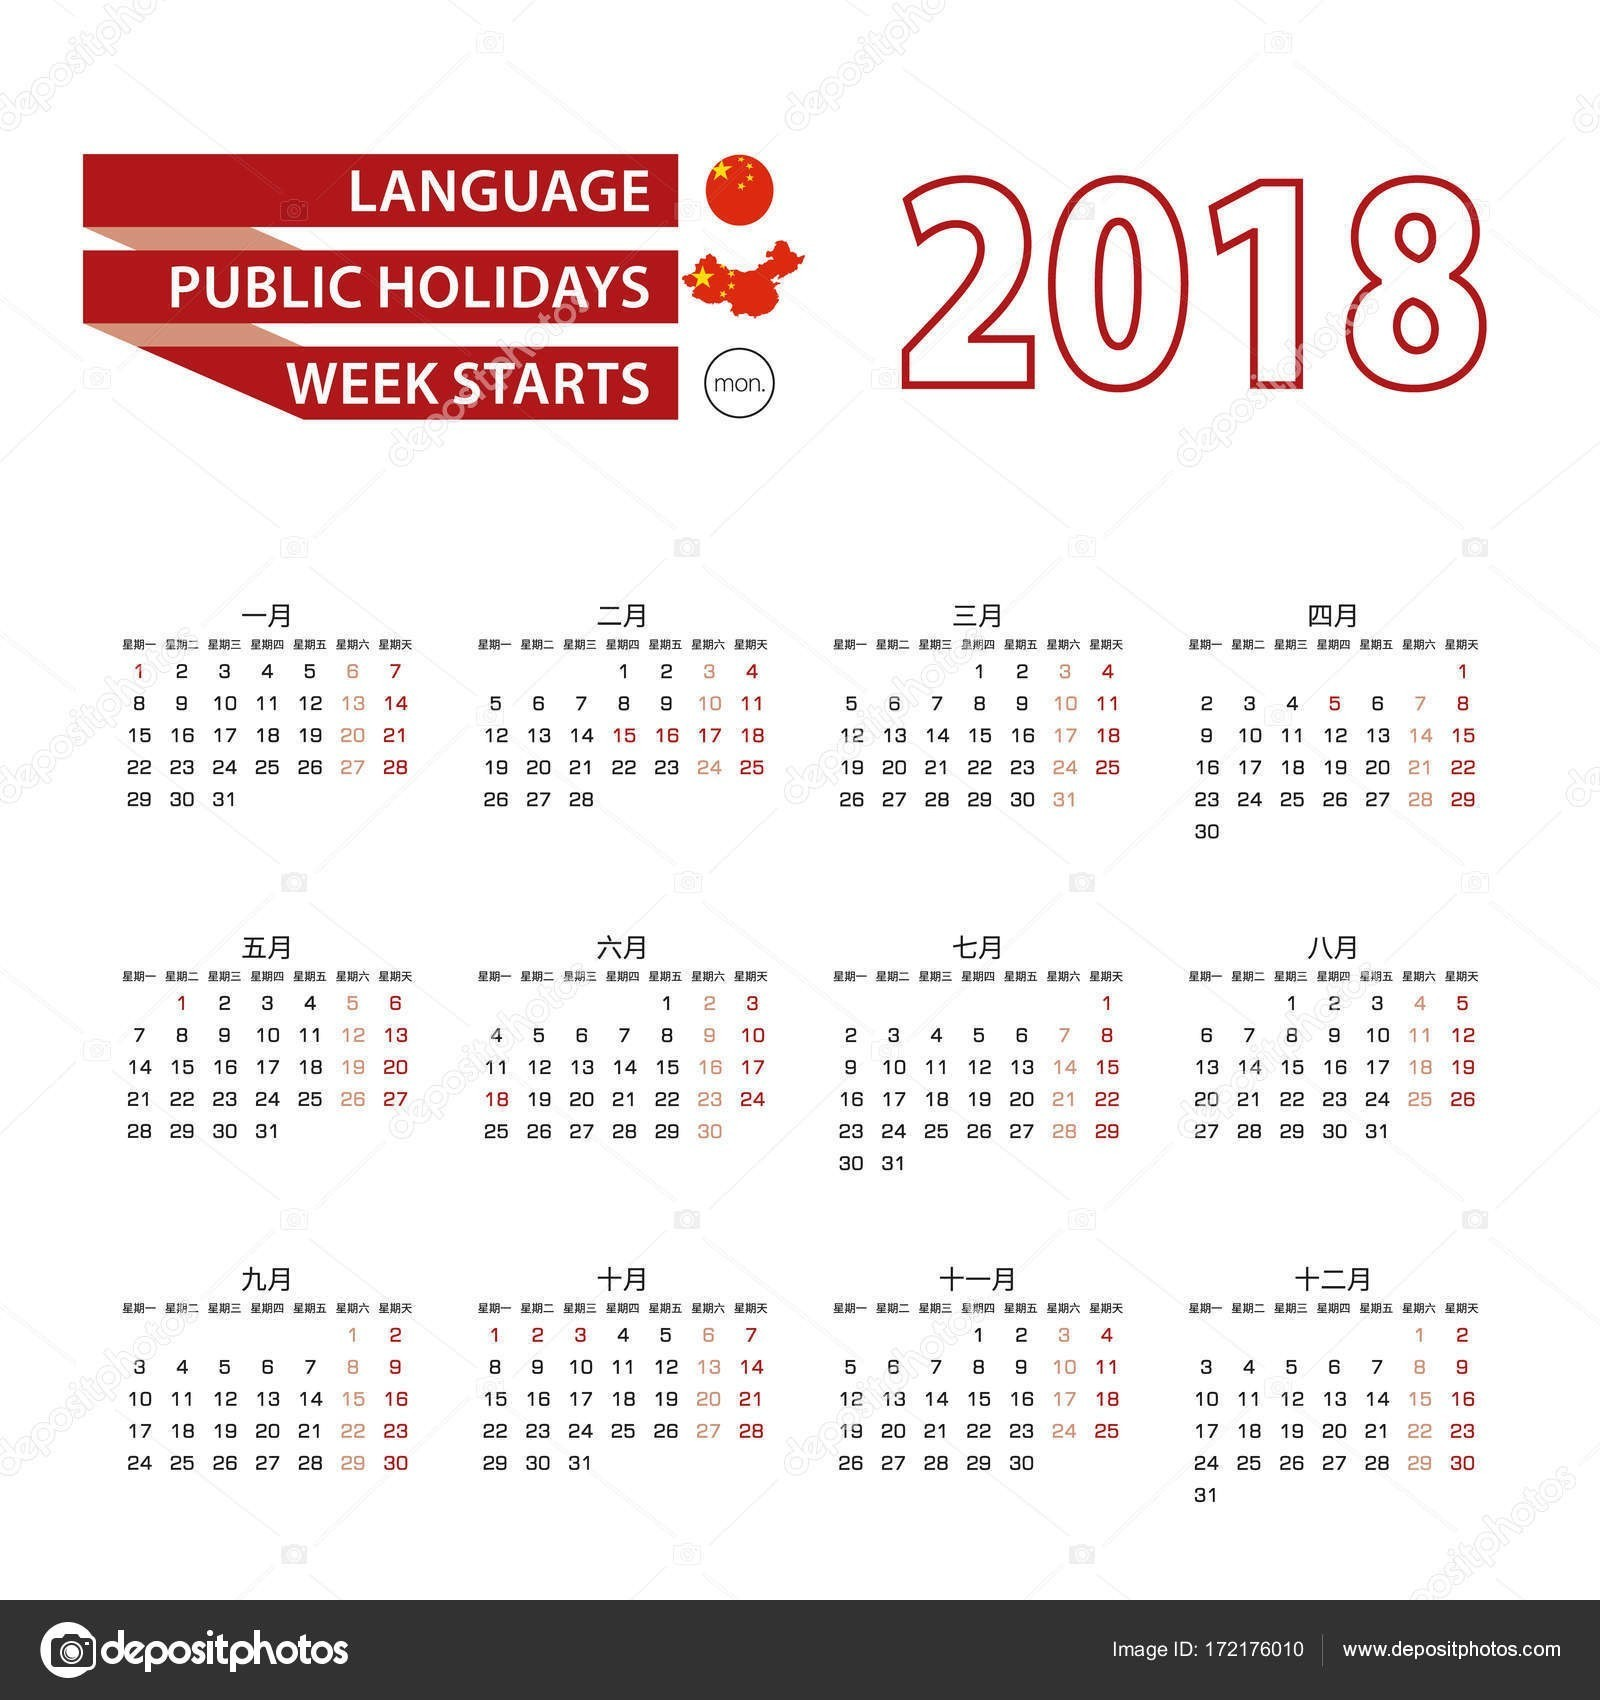 Calendario Enero 2019 Para Imprimir A4 Más Recientes Informes Kalender 2019 Mandarin Calendario 2019 Of Calendario Enero 2019 Para Imprimir A4 Más Arriba-a-fecha Calendario Abril 2019 Para Imprimir T